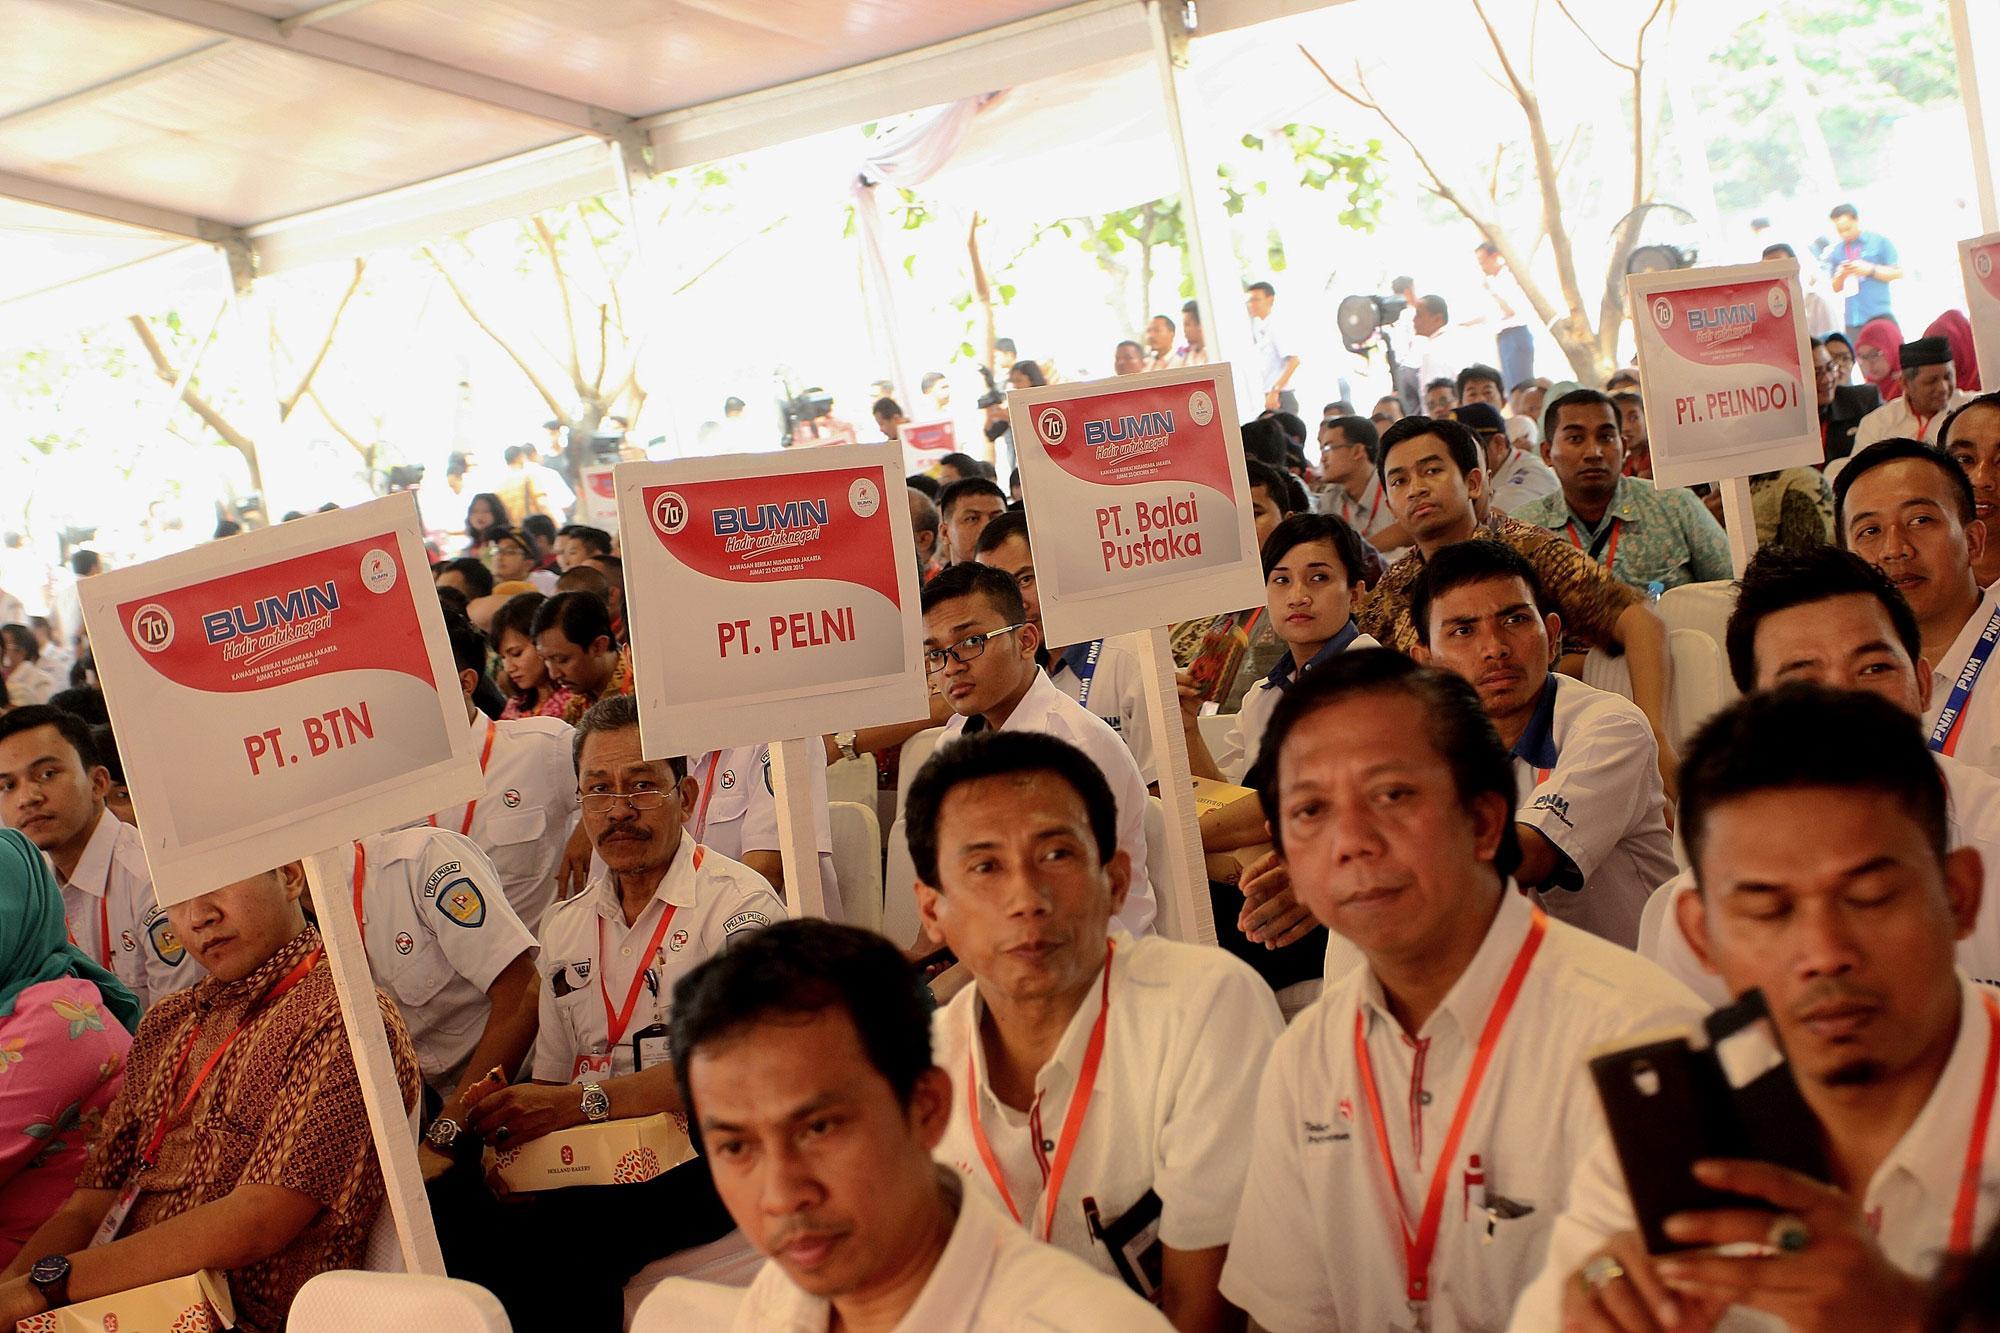 Dihadiri hampir 6000 karyawan tingkat dasar seluruh Kementerian BUMN Republik Indonesia beserta seluruh Badan Usaha Milik Negara (BUMN) di Indonesia, saat menggelar rangkaian acara \